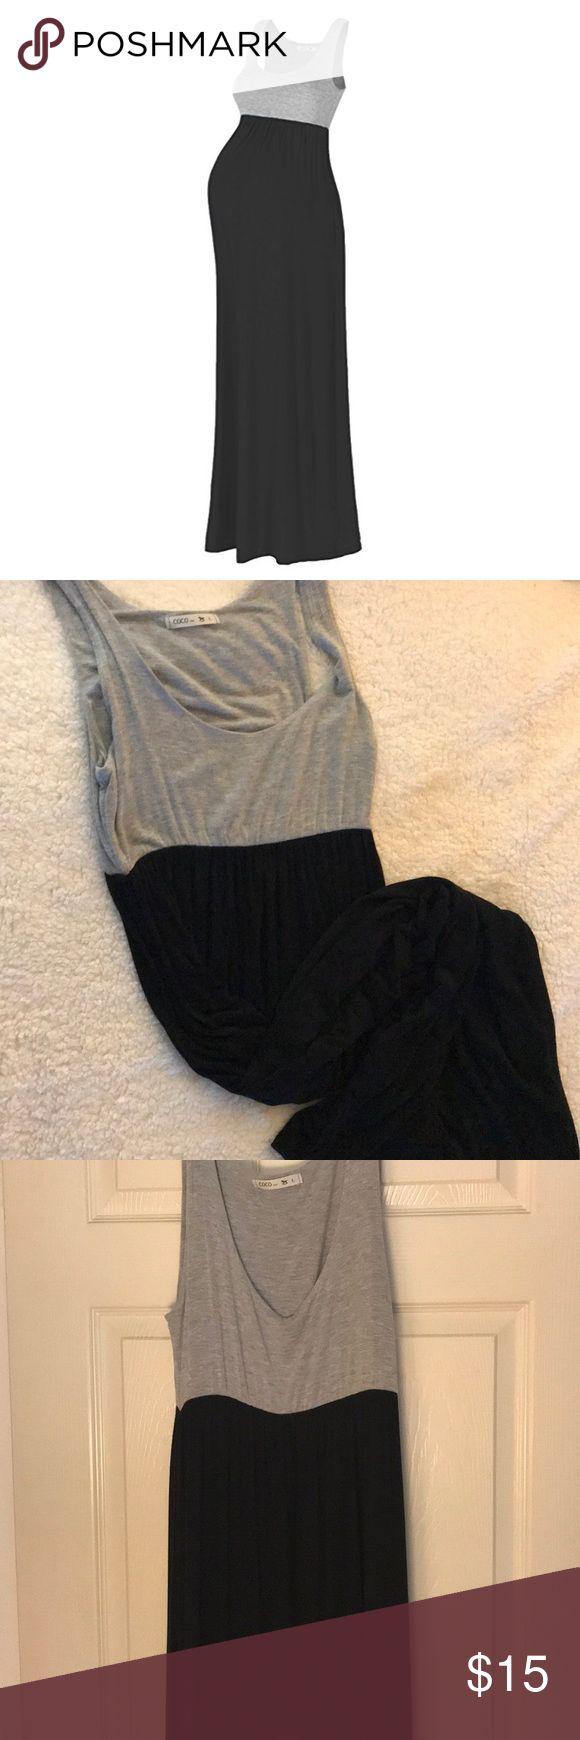 Maternity dress Beach coco black & grey maternity dress , so comfy ! Worn once Beachcoco Dresses Maxi